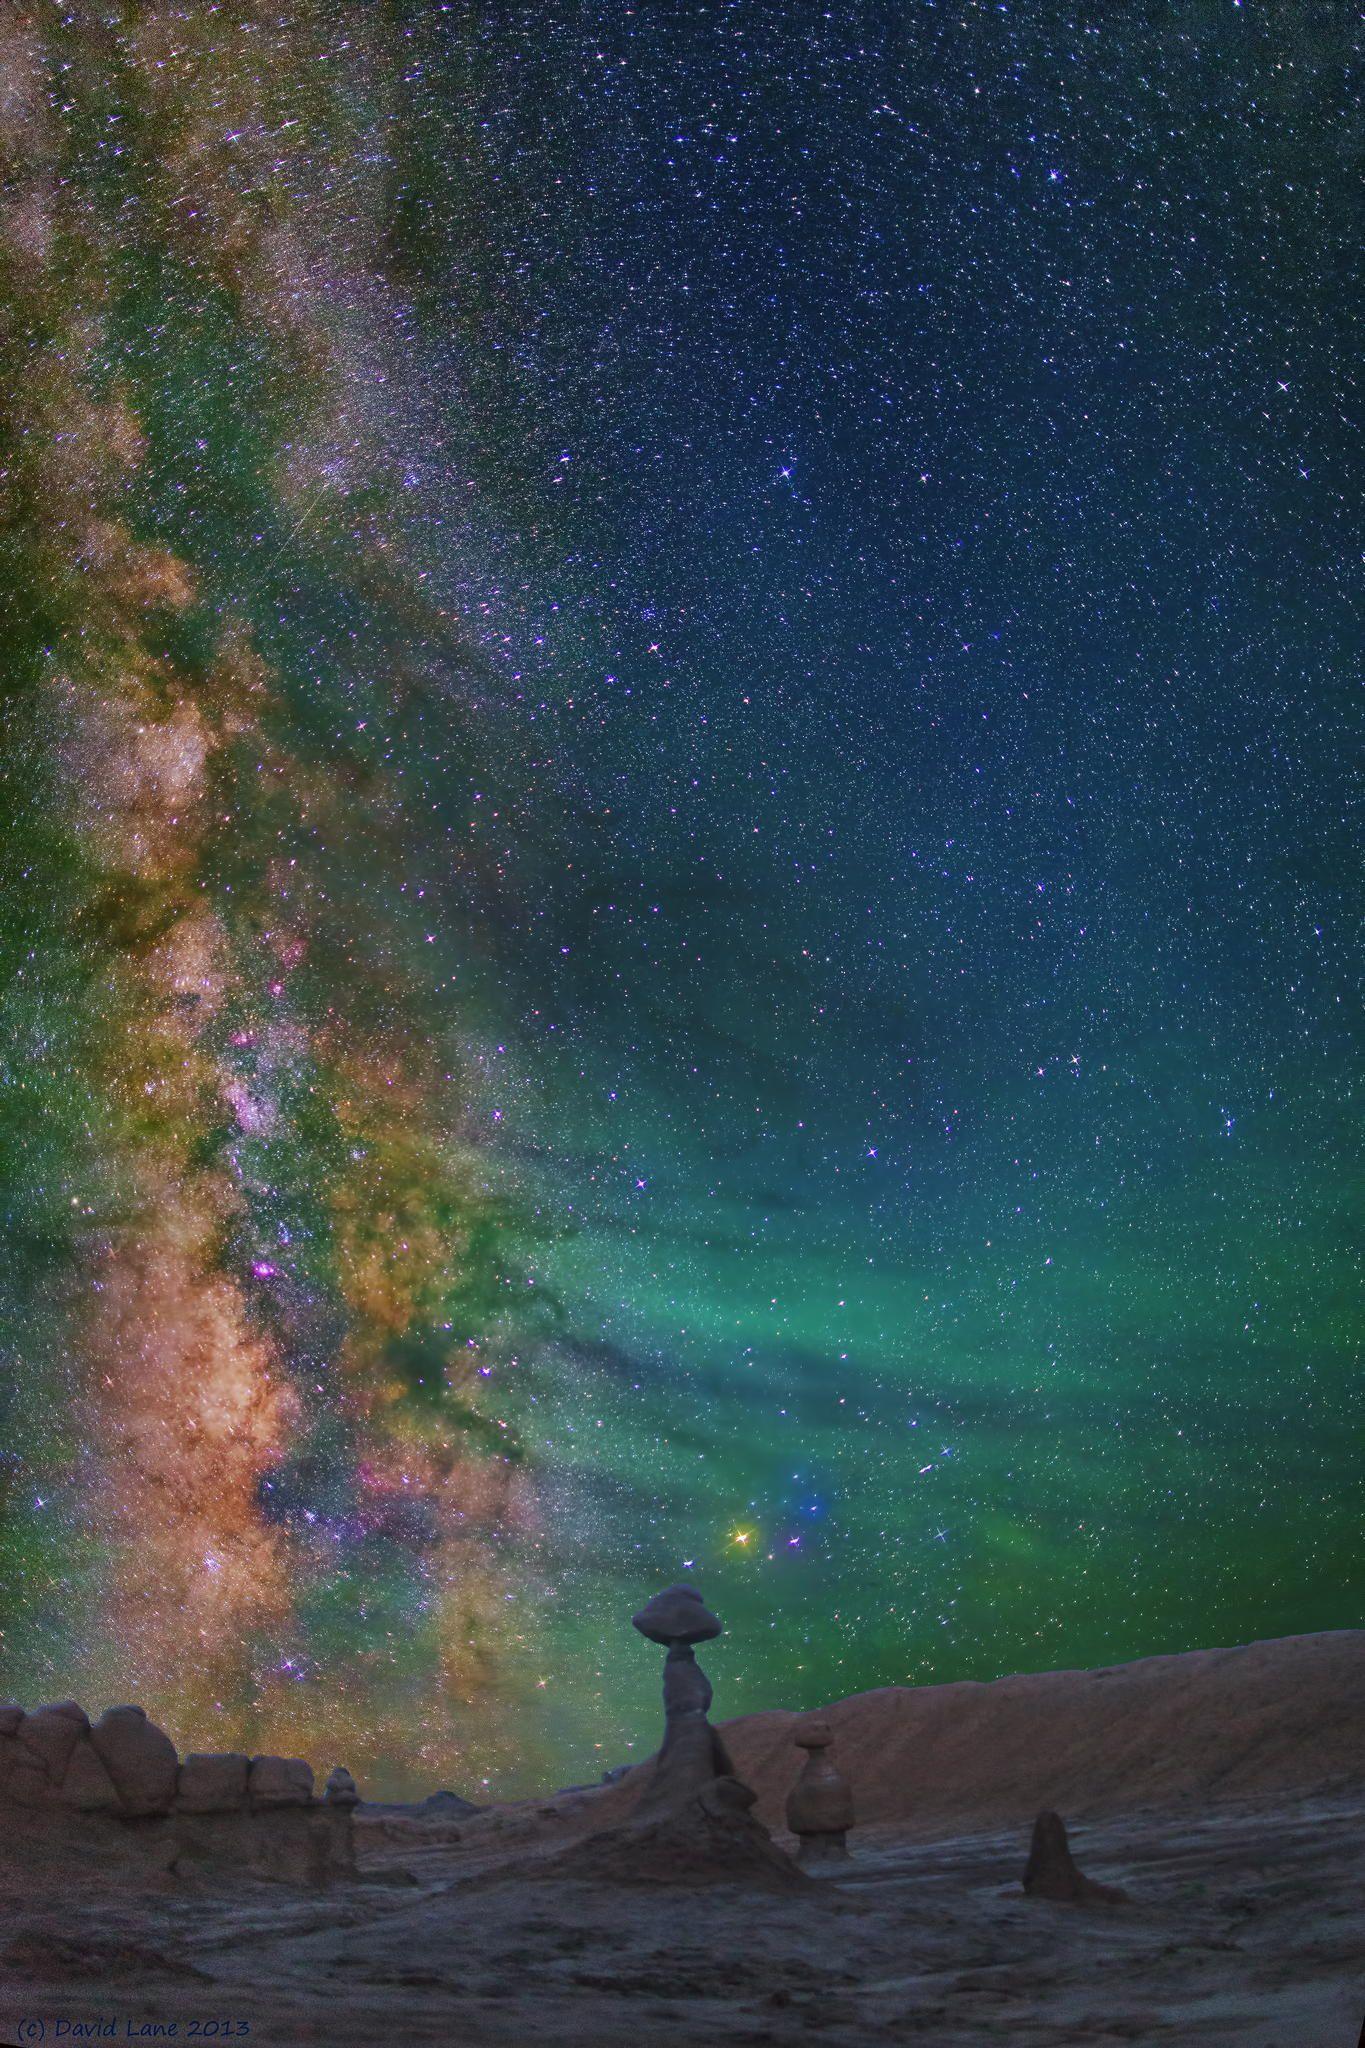 Milky way over Utah, USA  (by David Lane on 500px) #utahusa